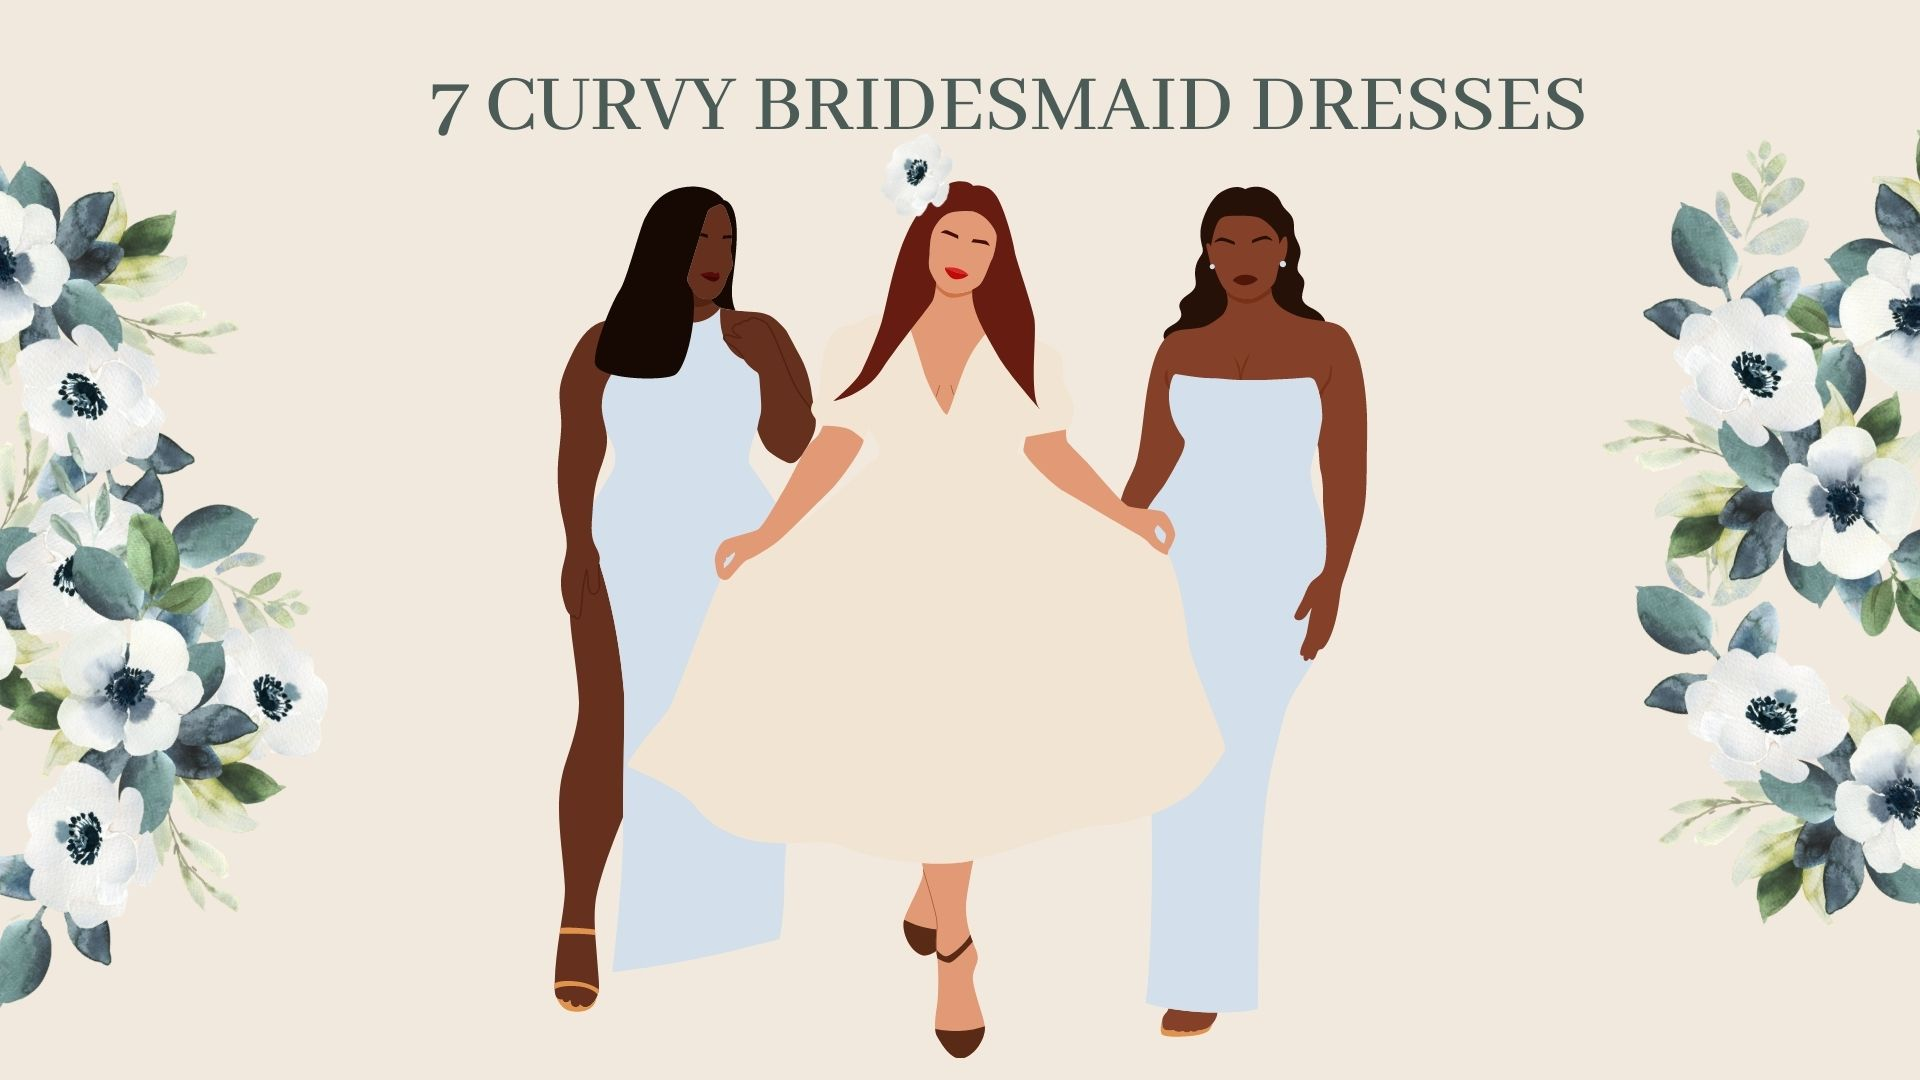 7 Curvy Bridesmaids Dresses